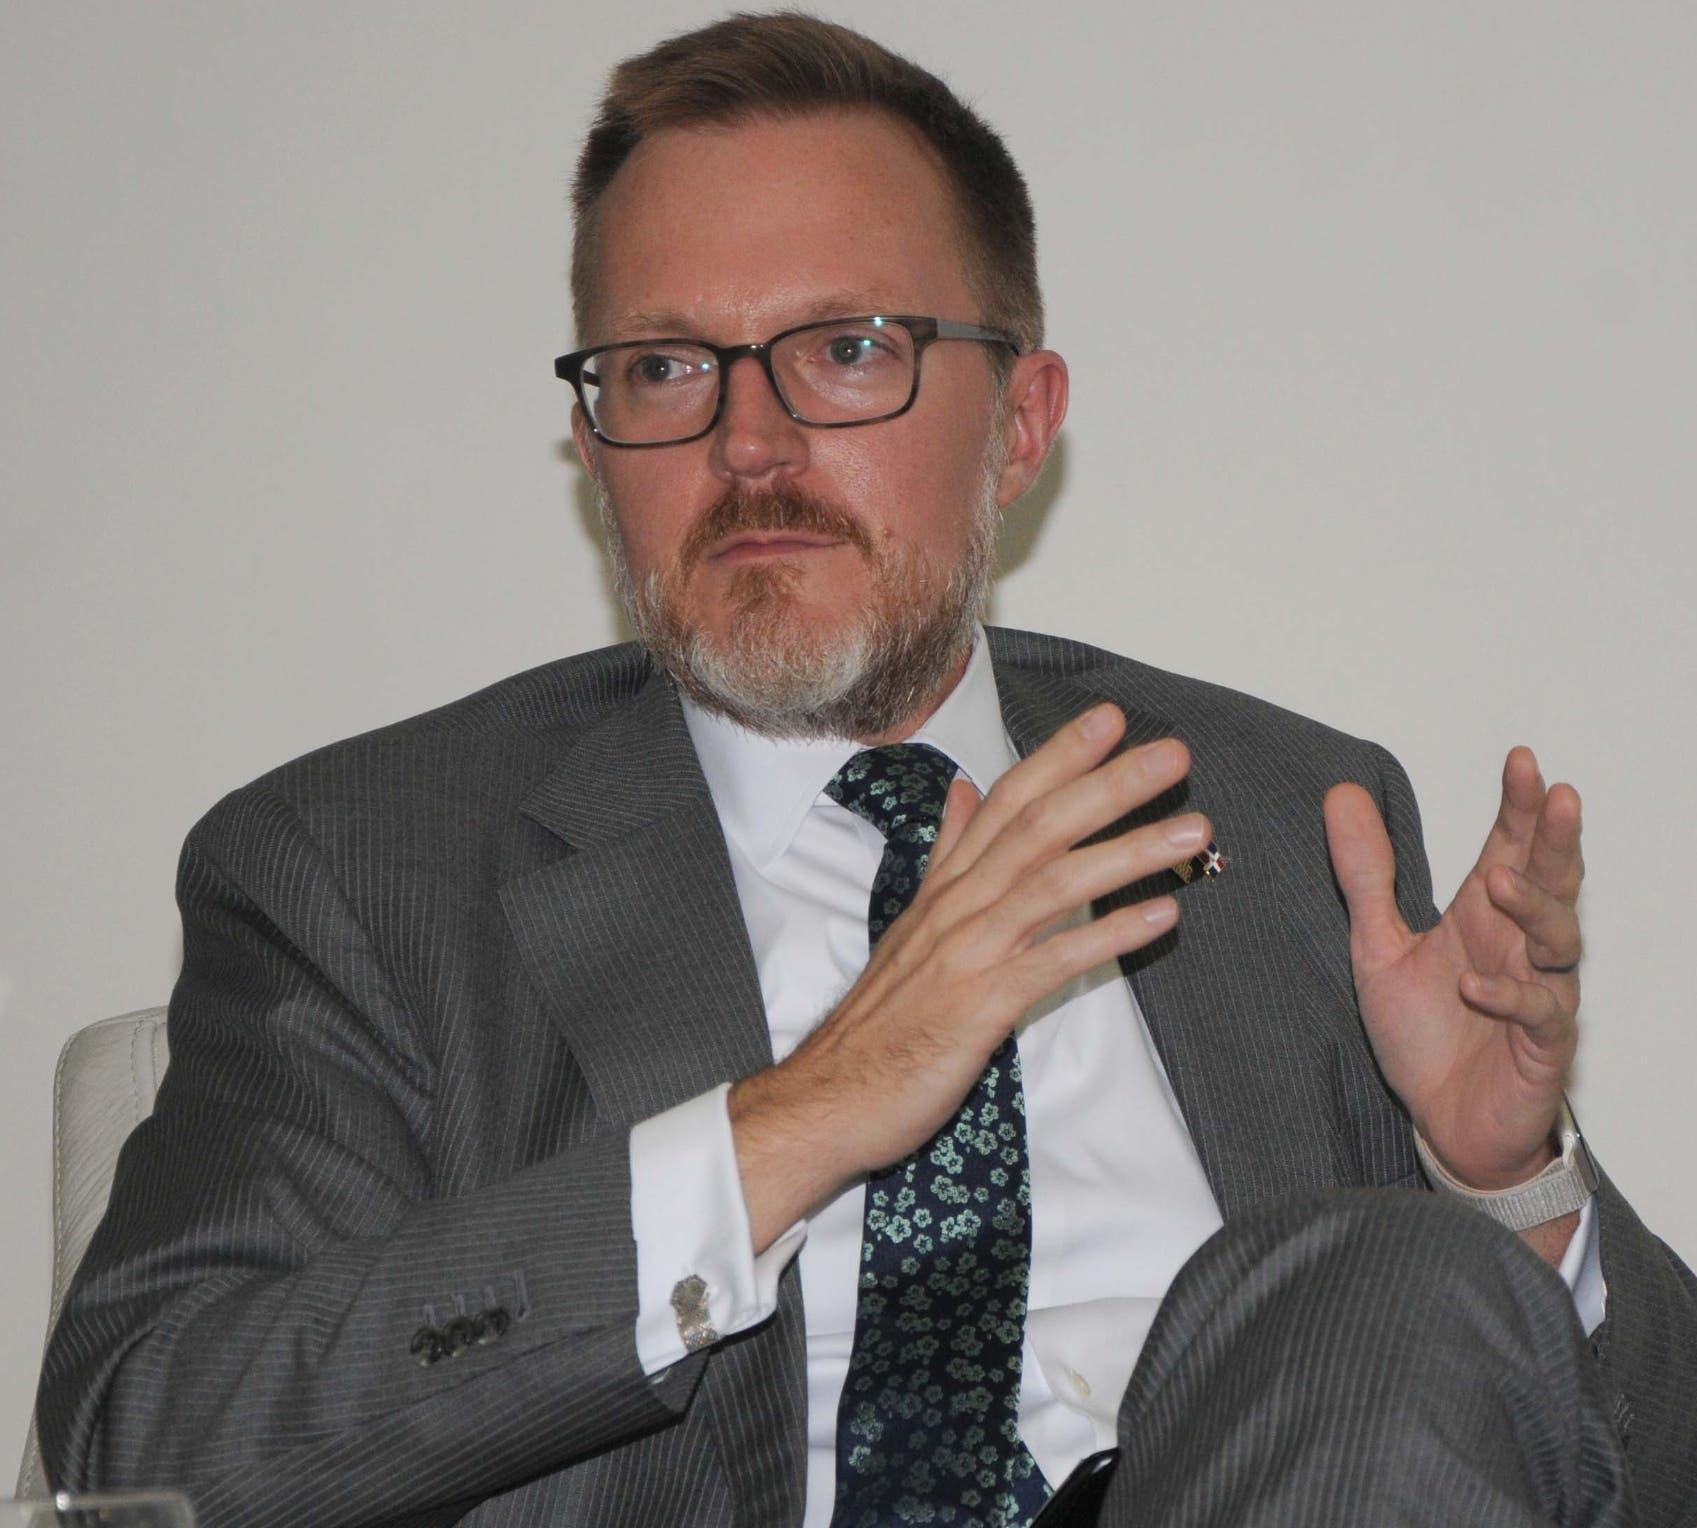 Asesoría de EE. UU. plantea modernizar asuntos internos de Policía Nacional